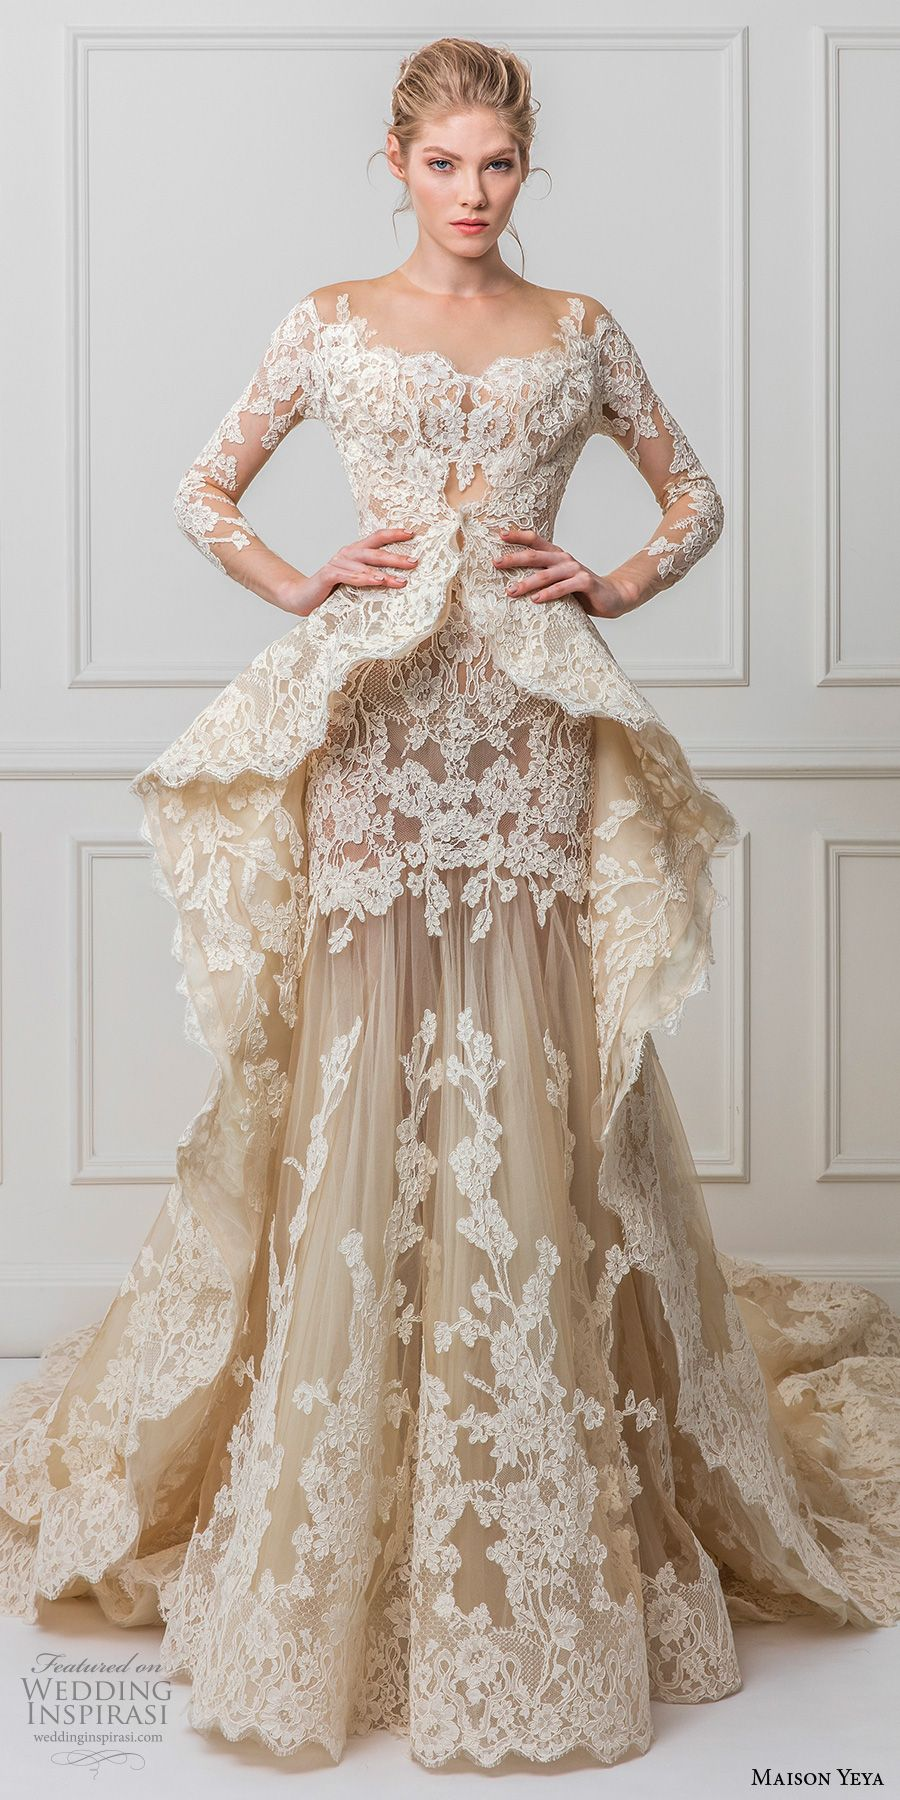 Maison Yeya 2017 bridal three quarter sleeves illusion jewel off the  shoulder full embellishment peplum ivory elegant glamourous lace a line  wedding dress ... b7a66425d